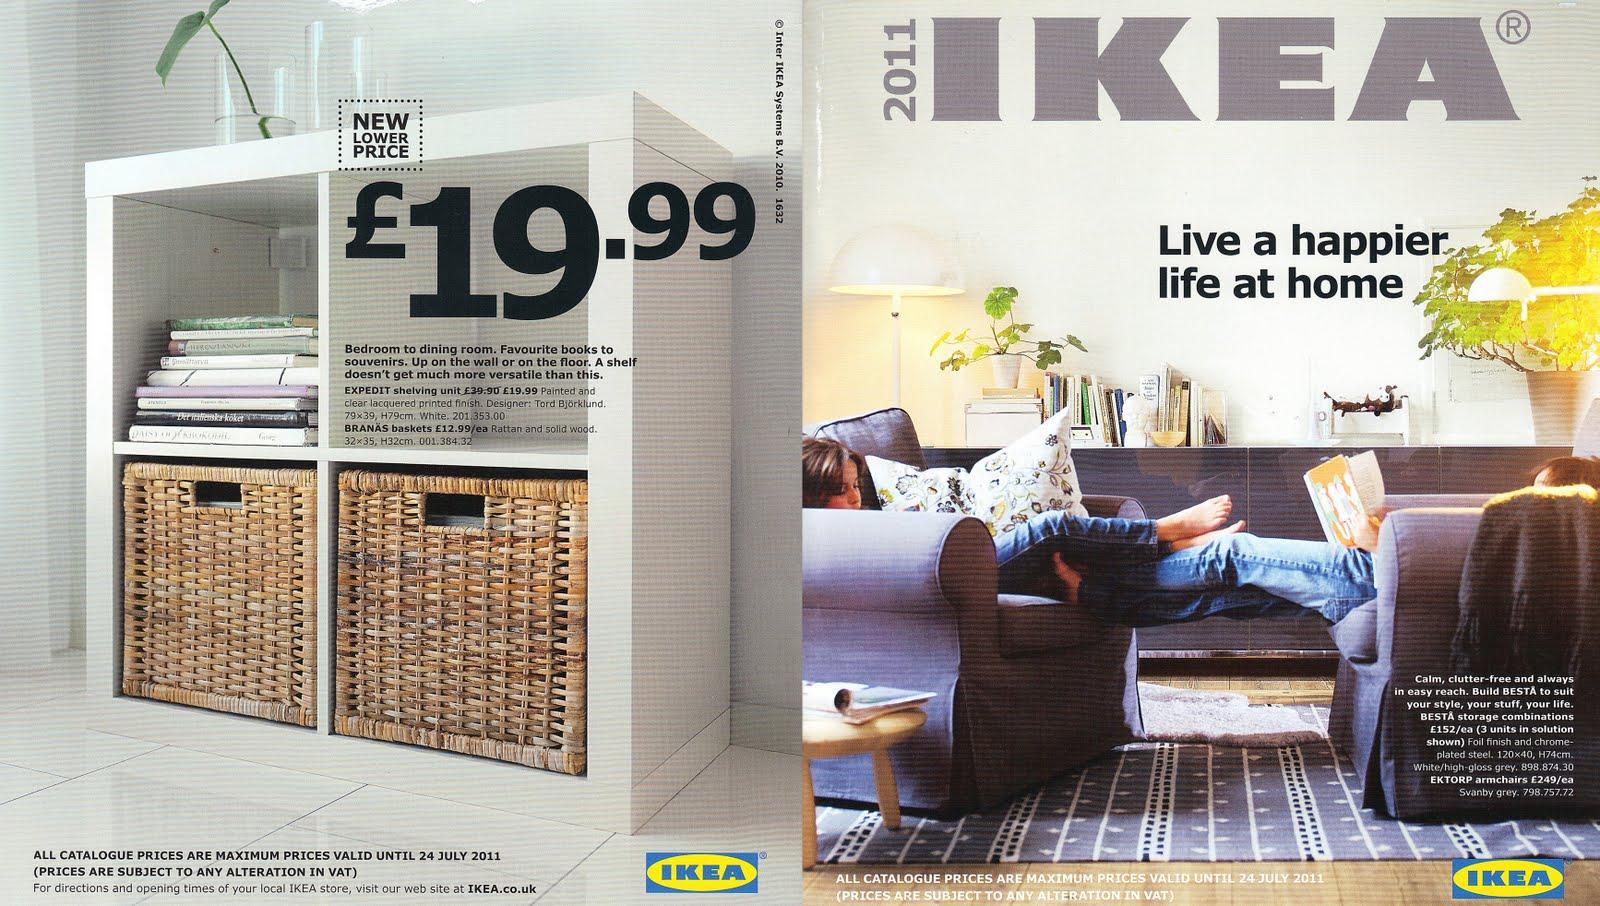 IKEA Catalogue. Ikea Catalogue